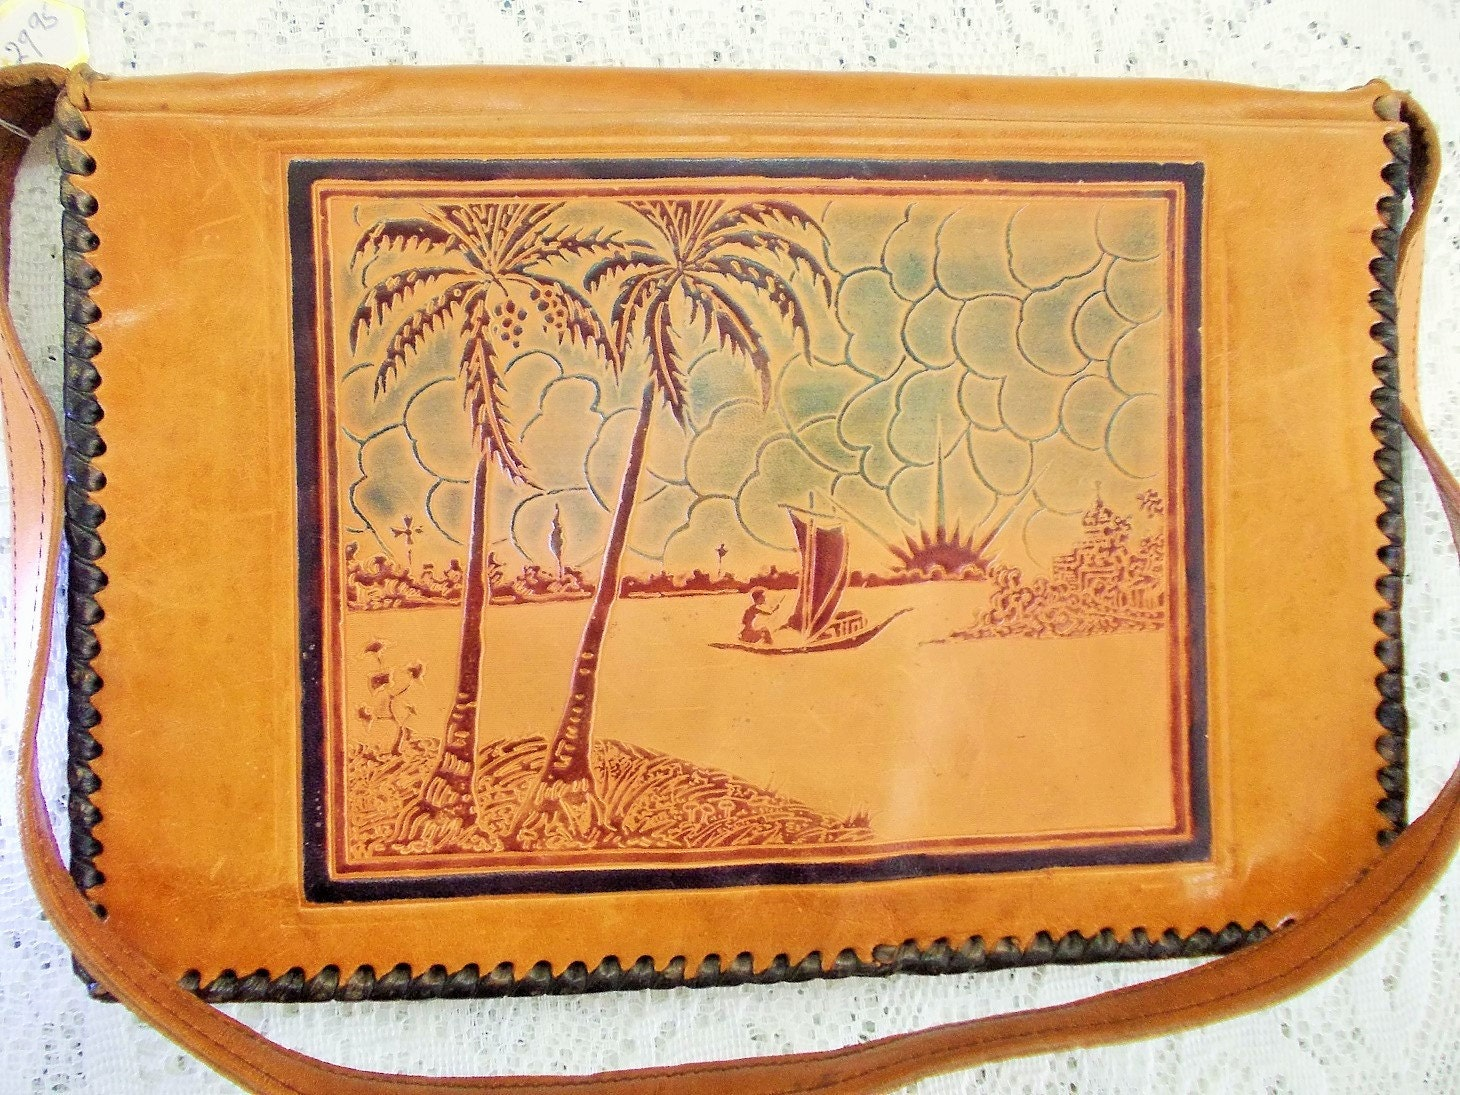 6520cb6e58 Vintage envelope handbag hand tooled painted leather indian images taj  mahal etc jpg 1460x1095 Vintage egyptian